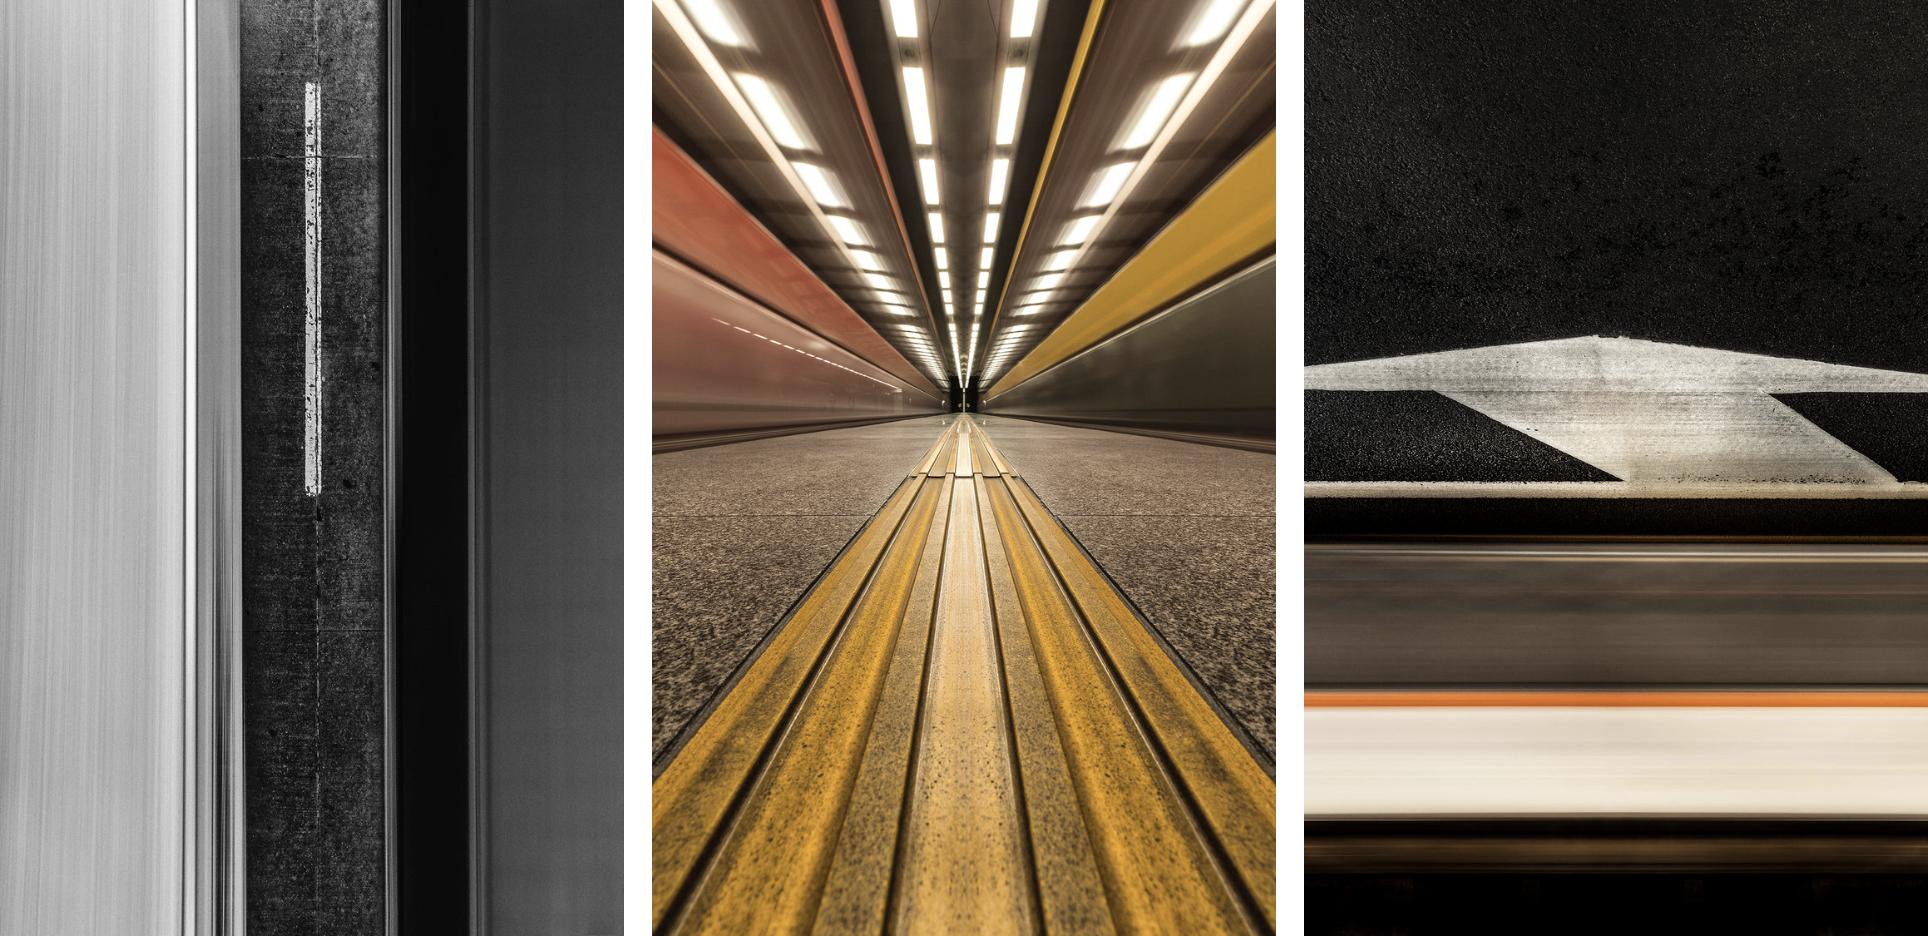 In Transit bonjourmolotov Andre Gigante Photography Experimenta Design 10.png